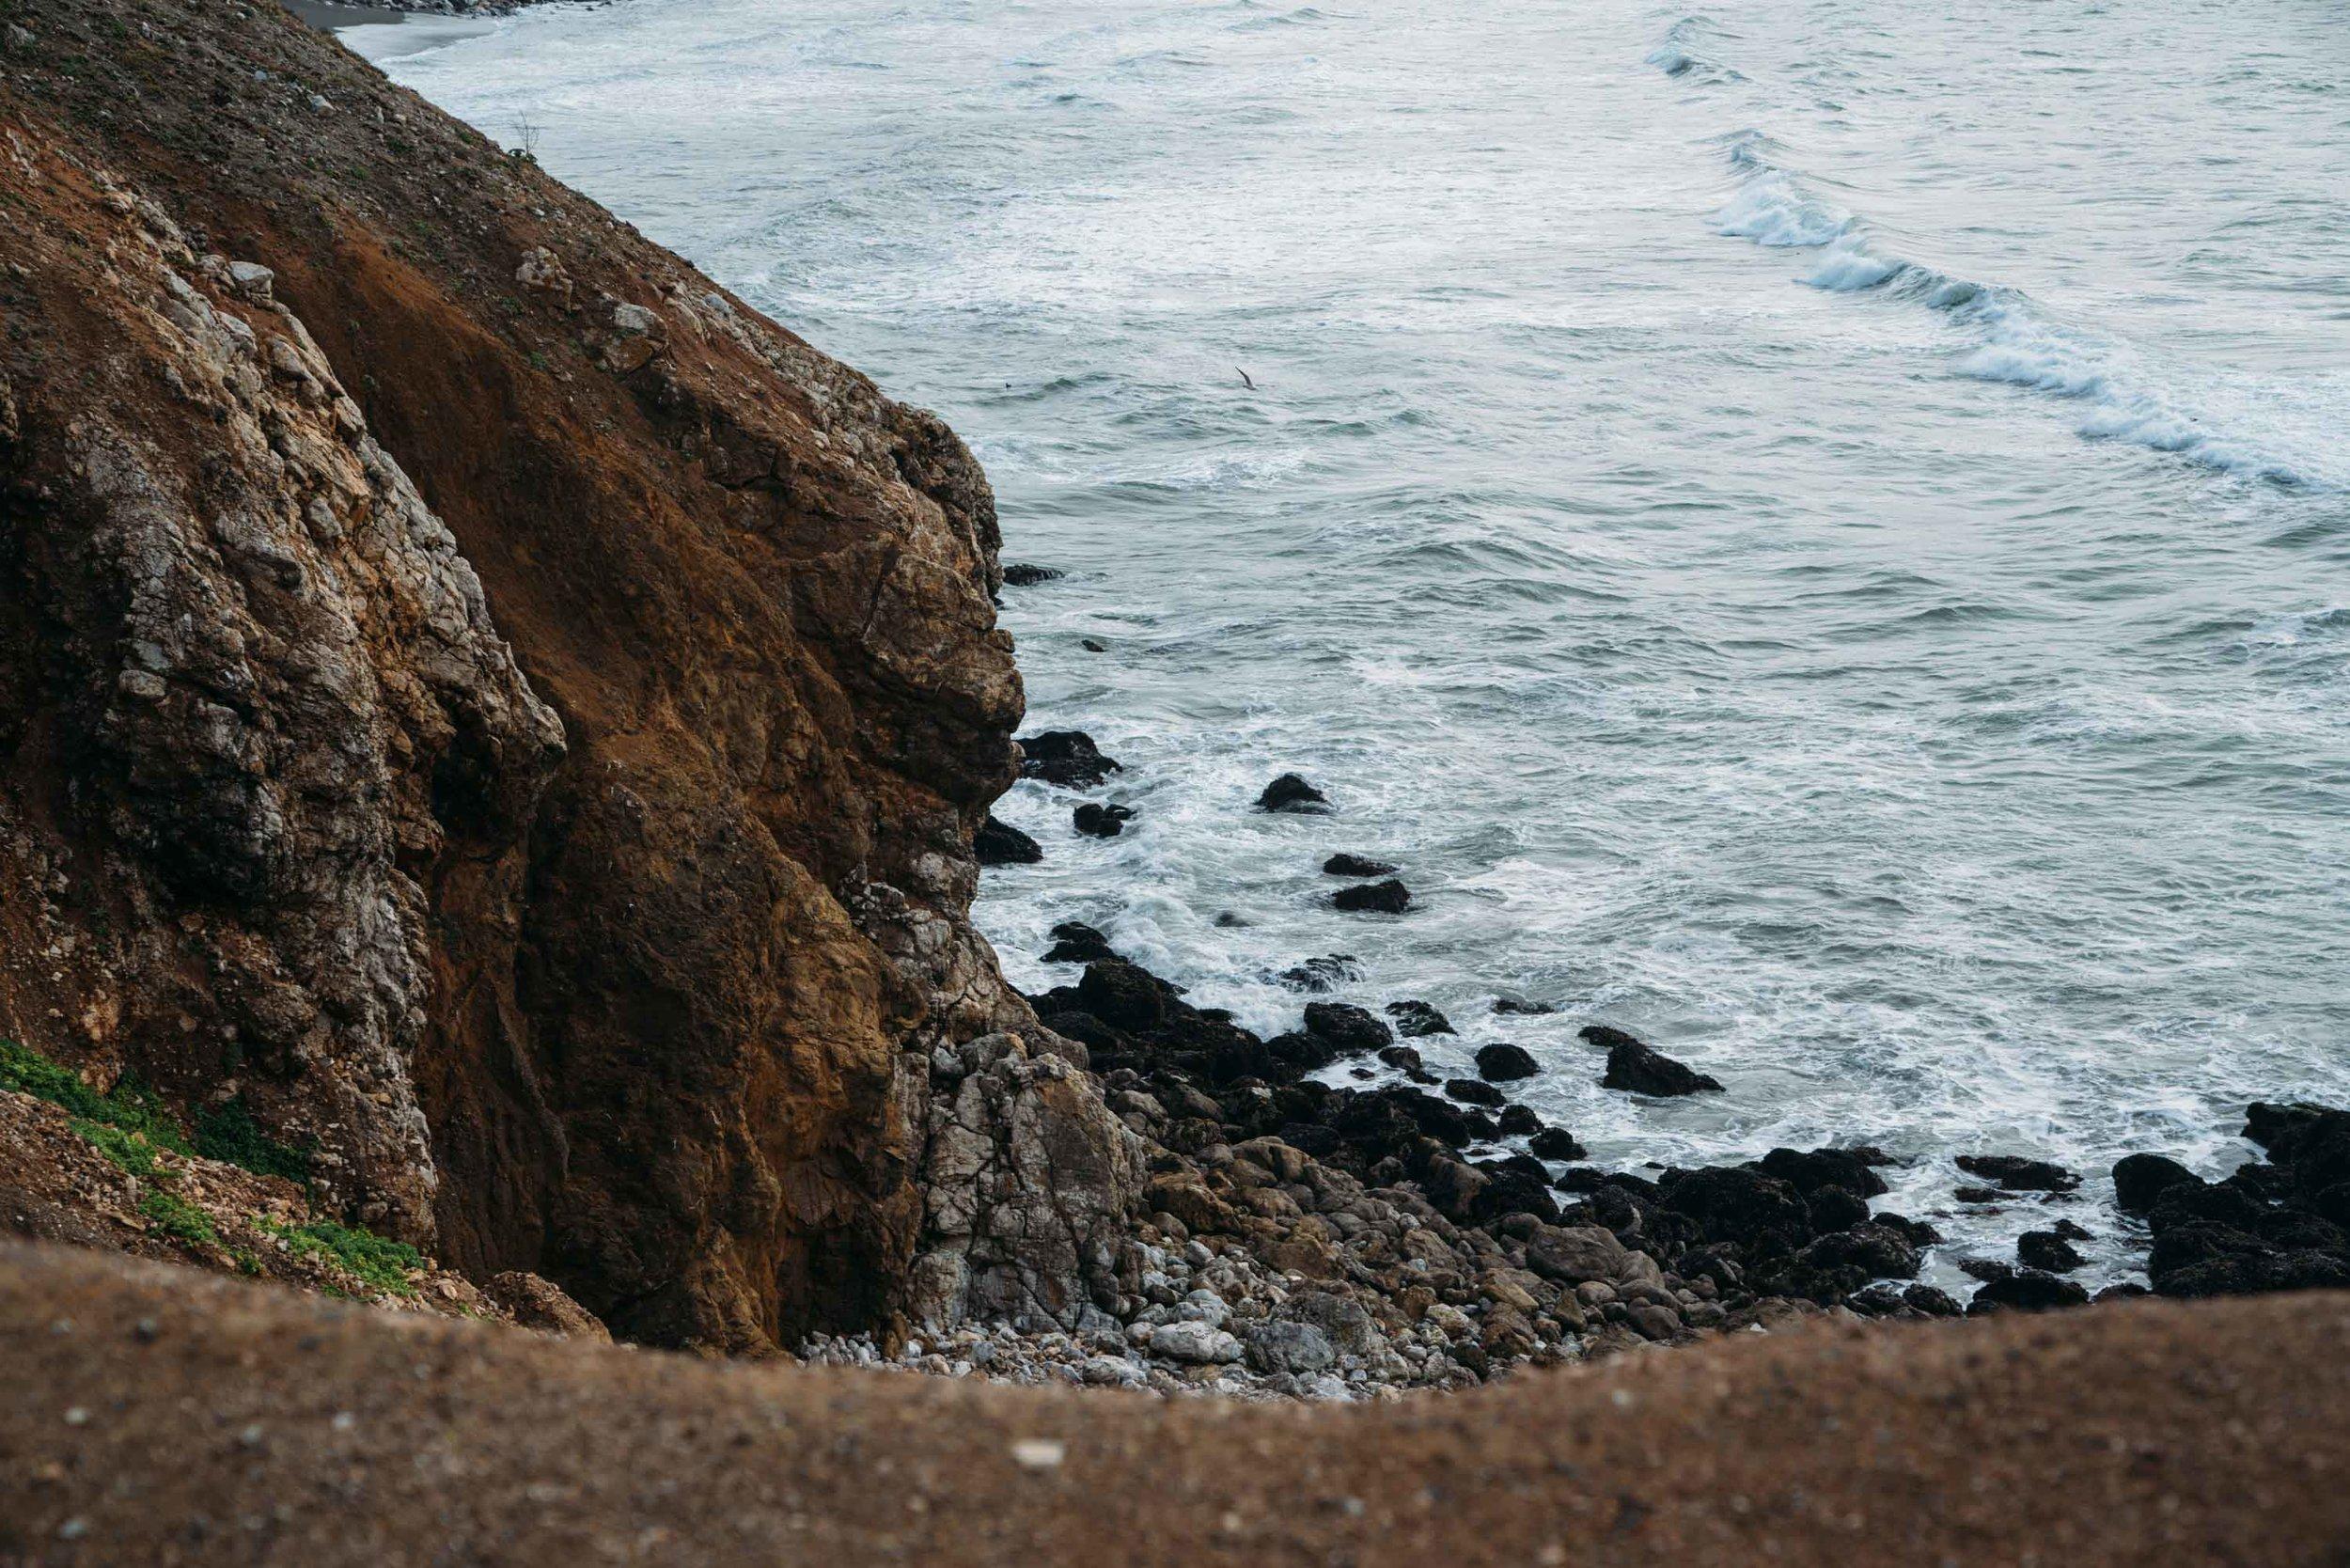 kyson-dana-rockaway-beach-nov-45.jpg